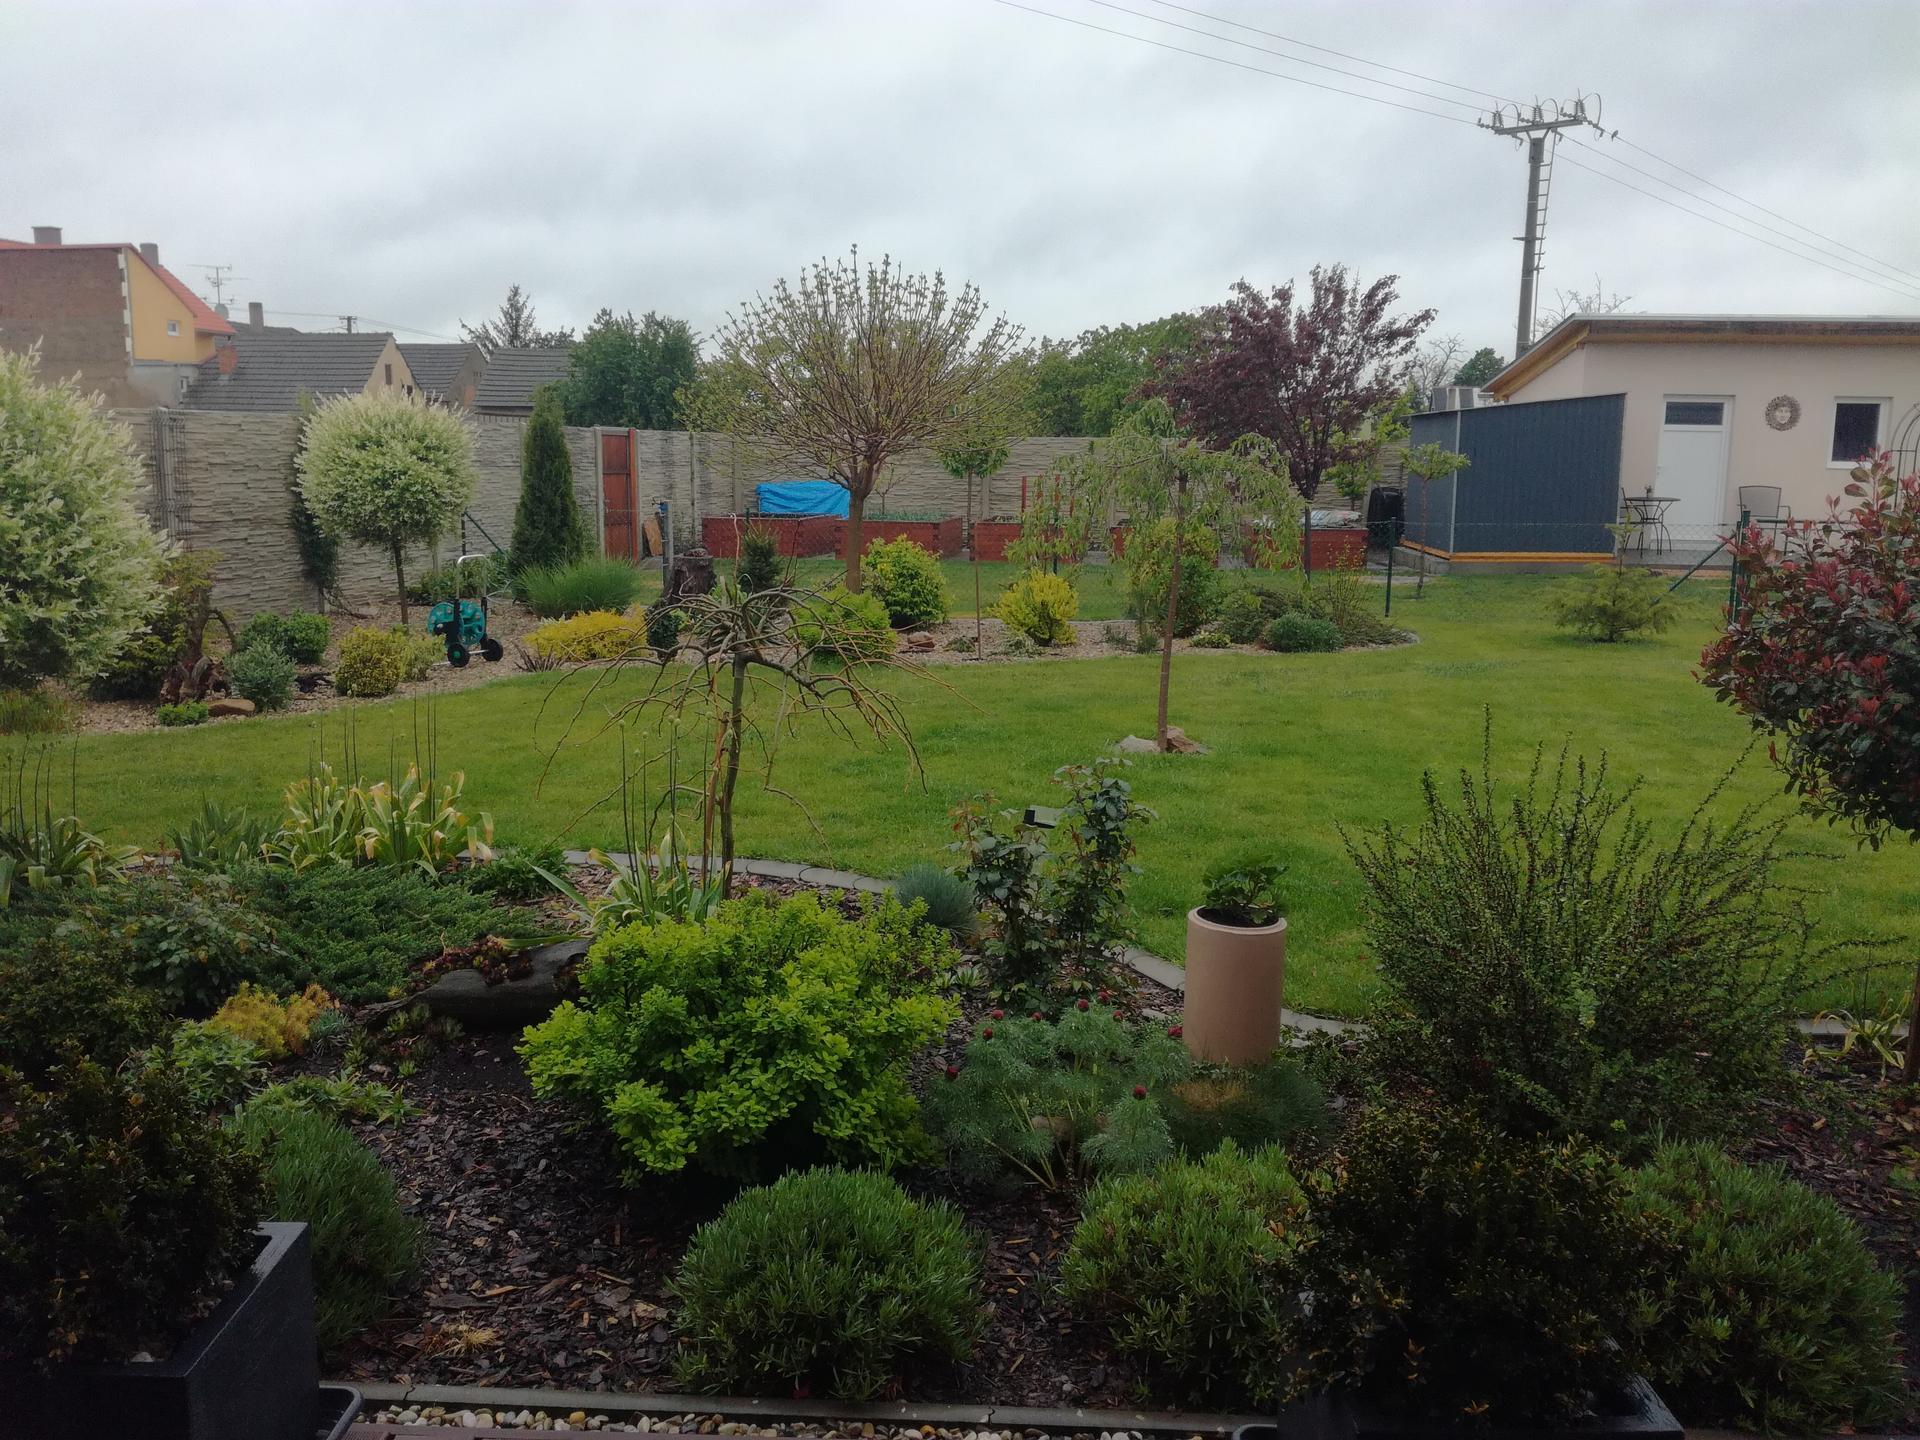 Zahrada 2021 🌲 - Obrázek č. 60